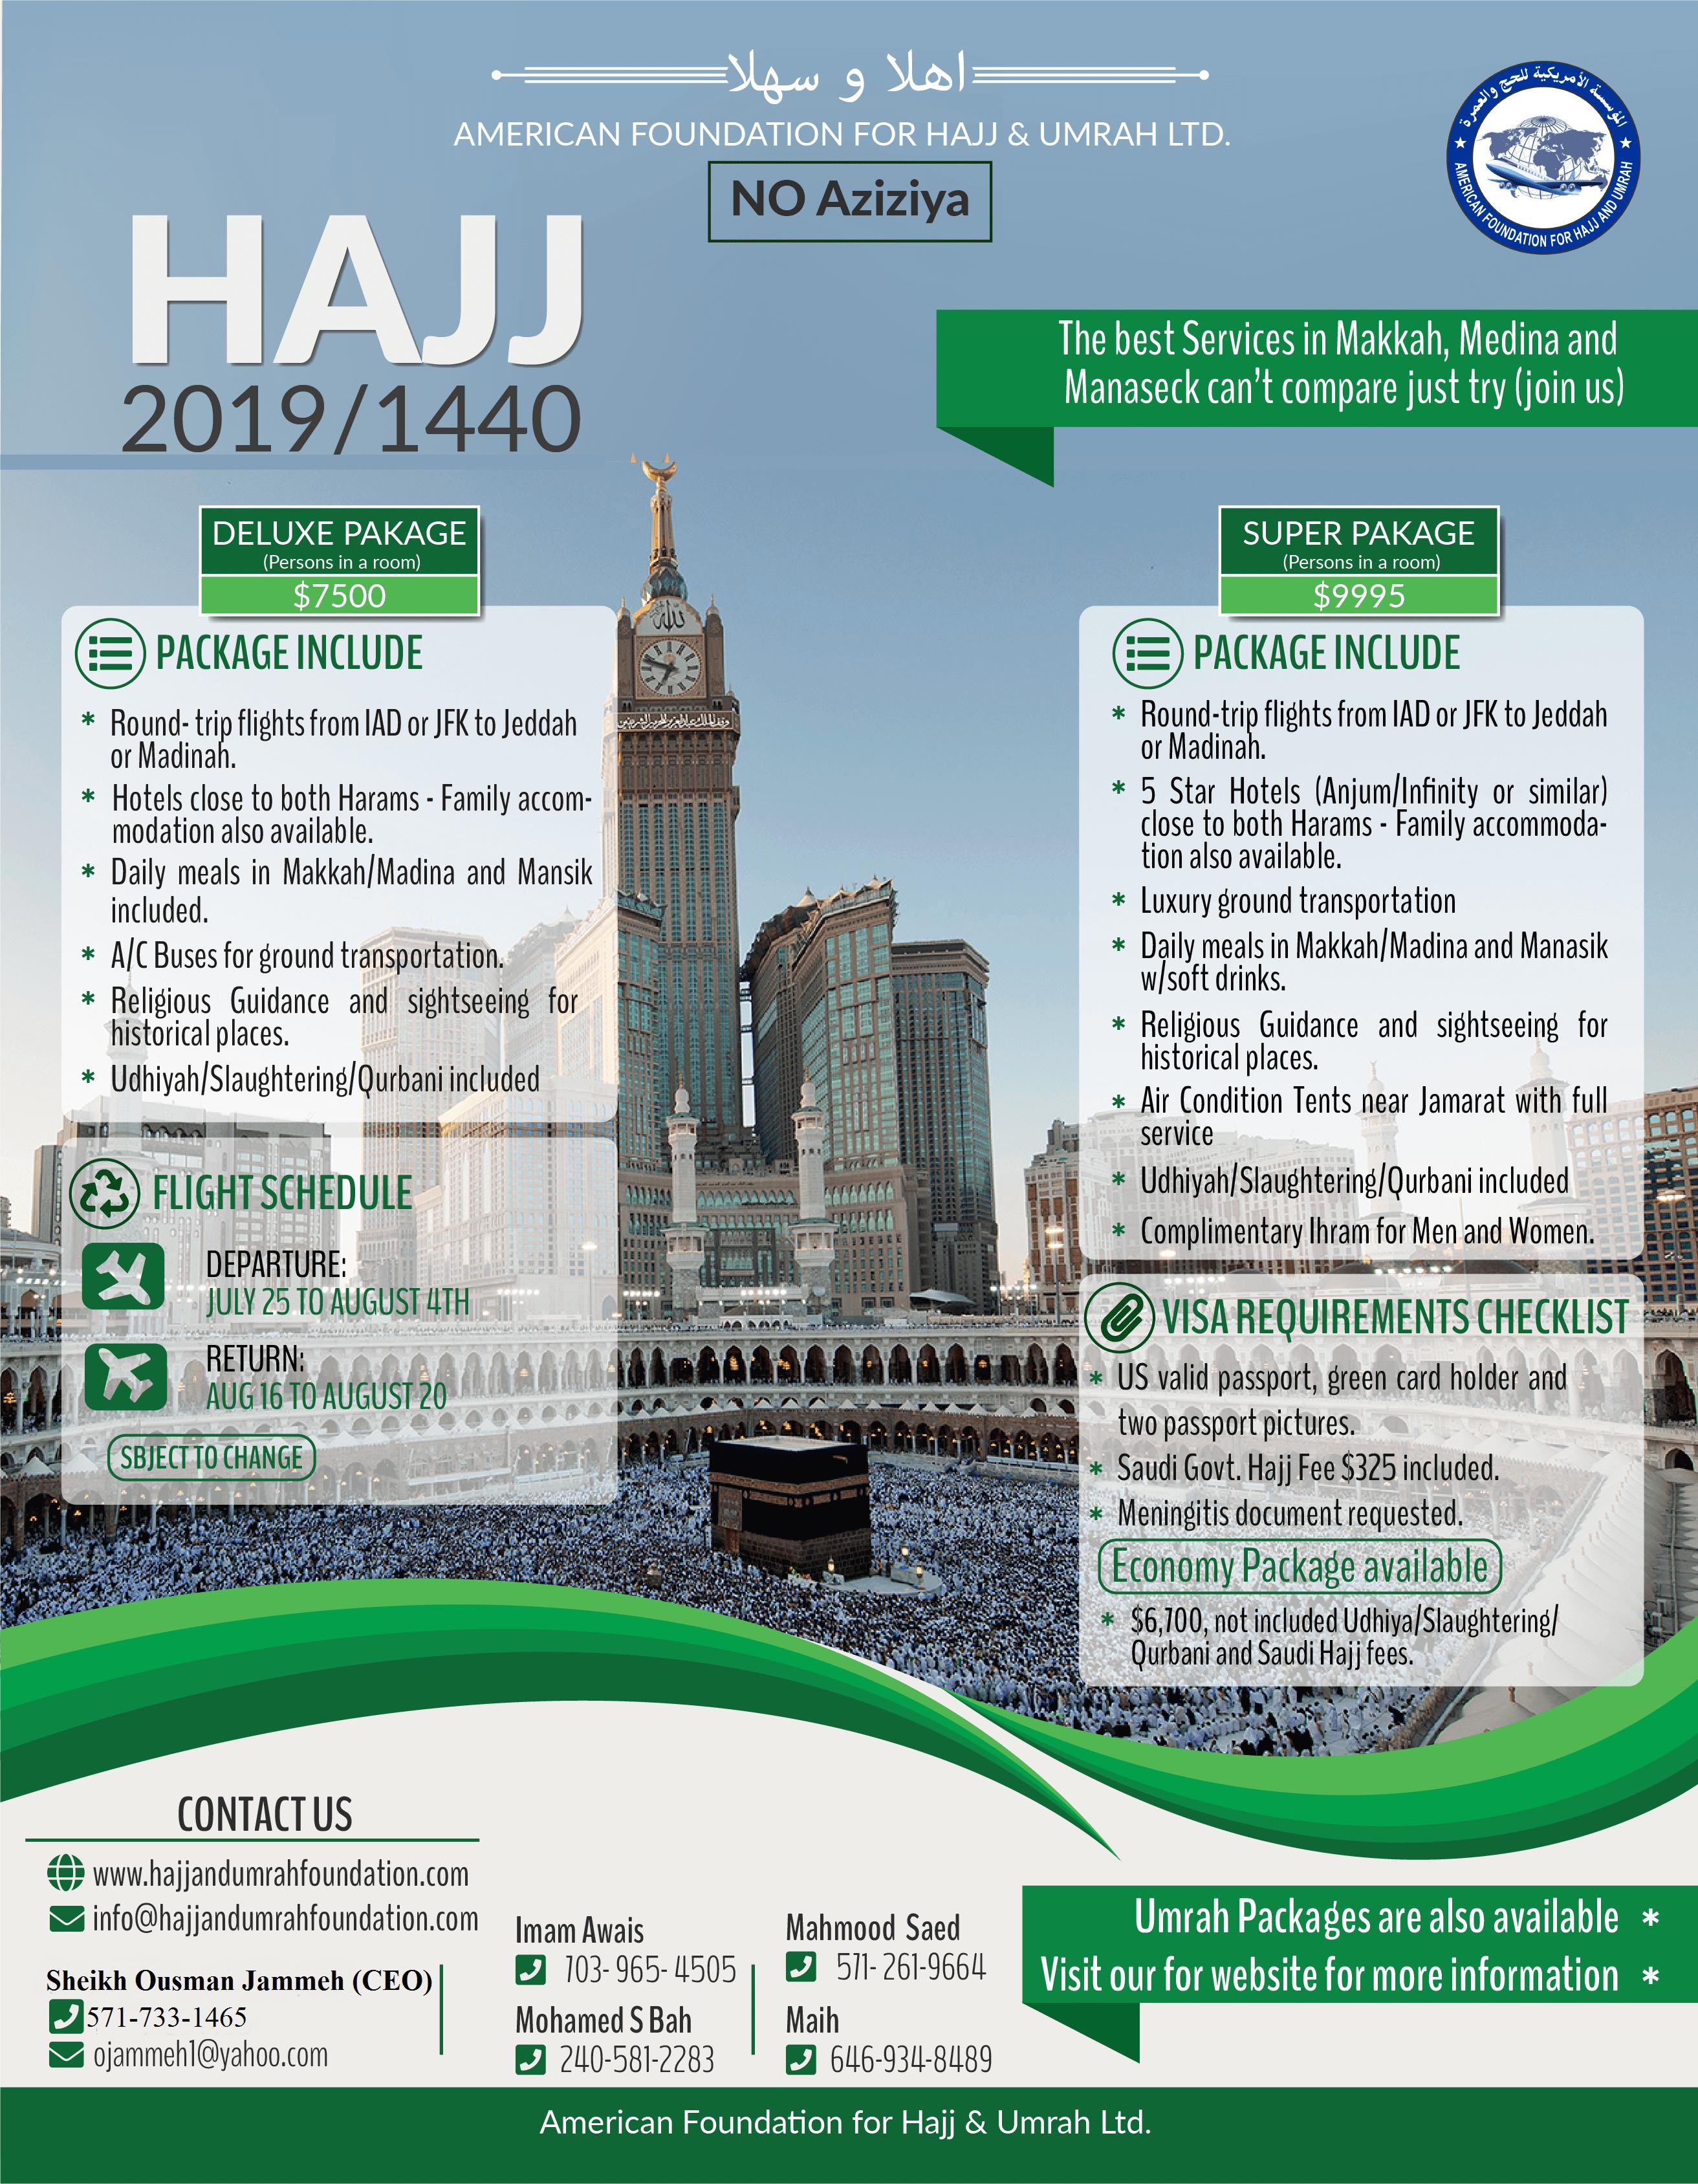 About – Hajj